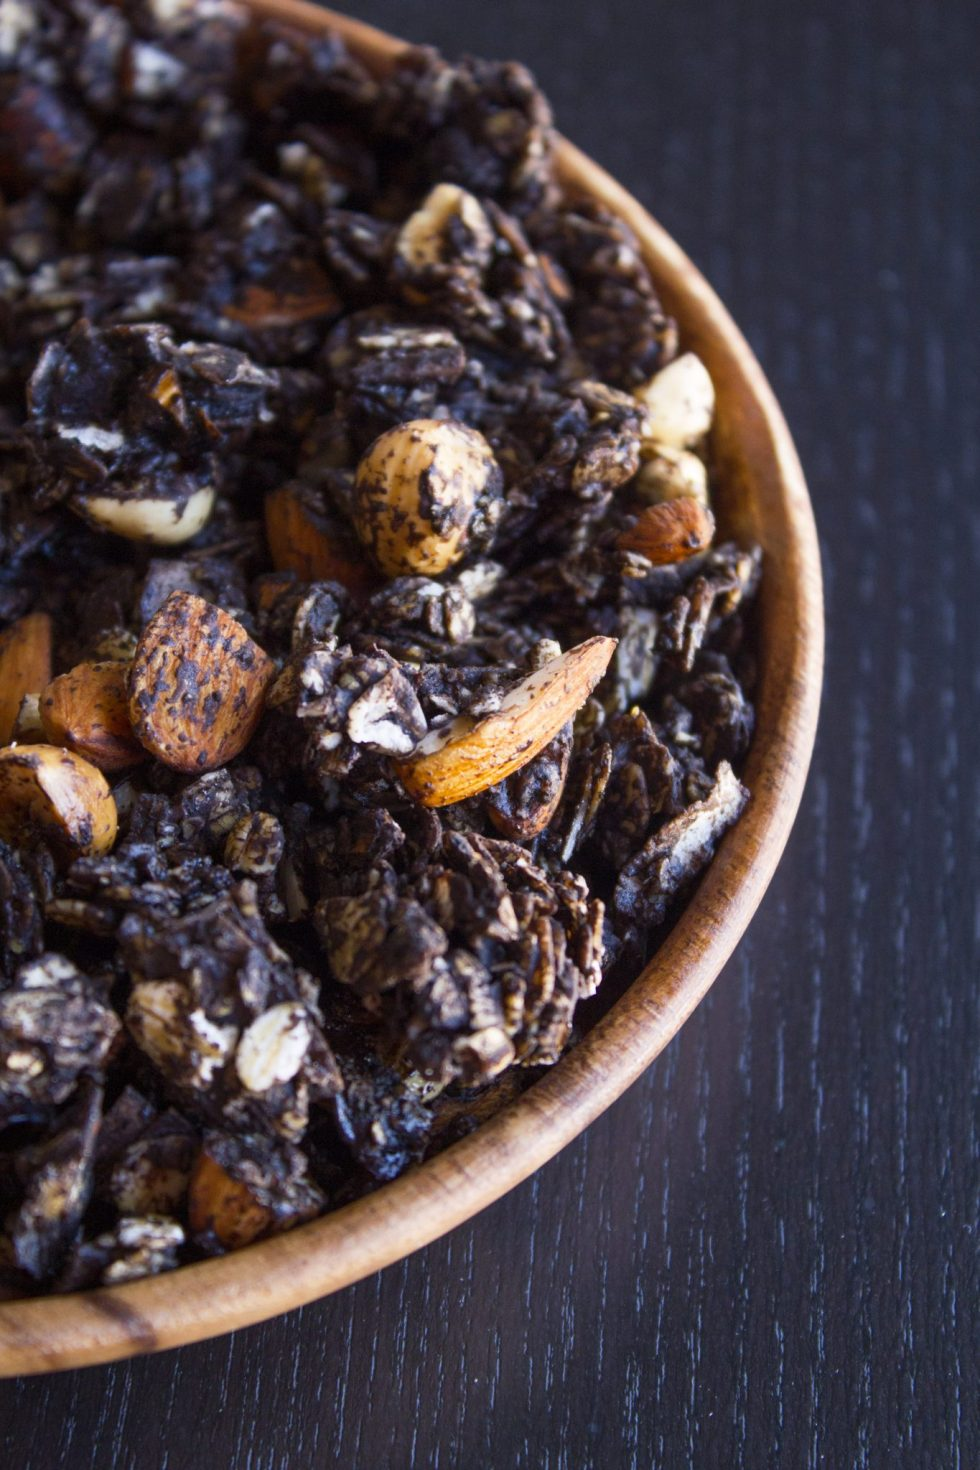 Chocolate Nut Crunch Granola | Wife Mama Foodie